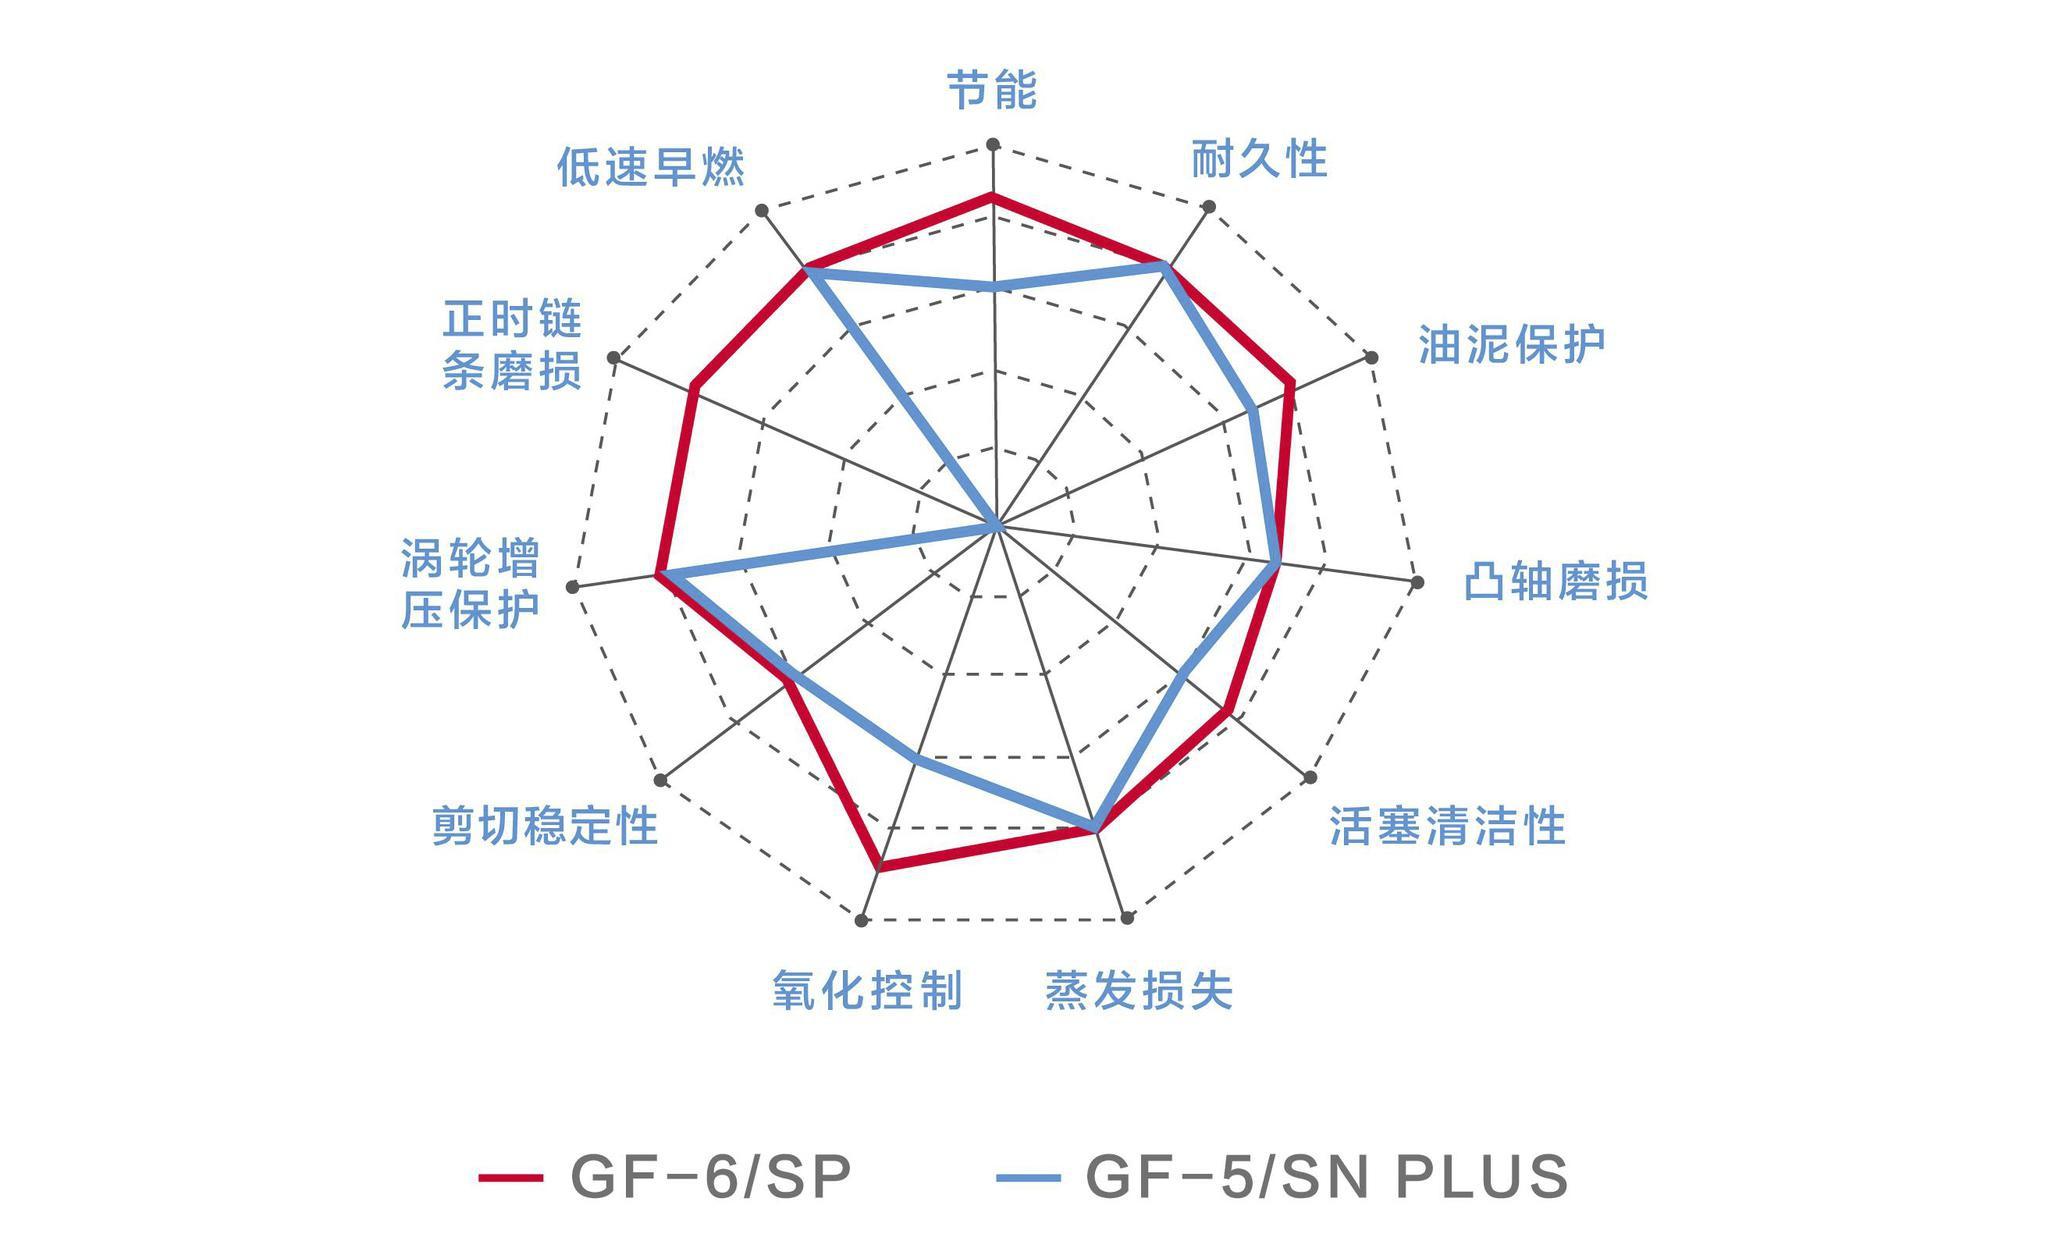 API SP相比API SN+ 优势